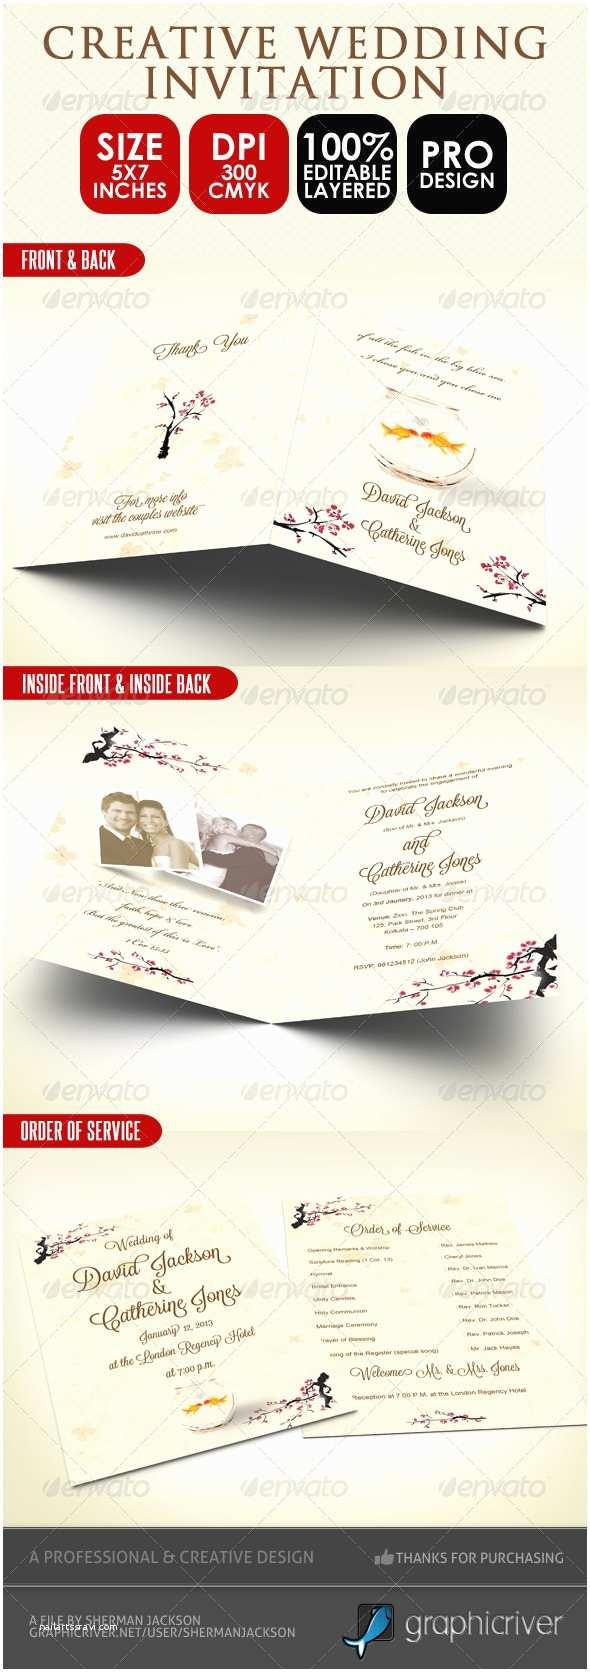 Wedding Invitation Service Creative Wedding Card & order Of Service Psd by